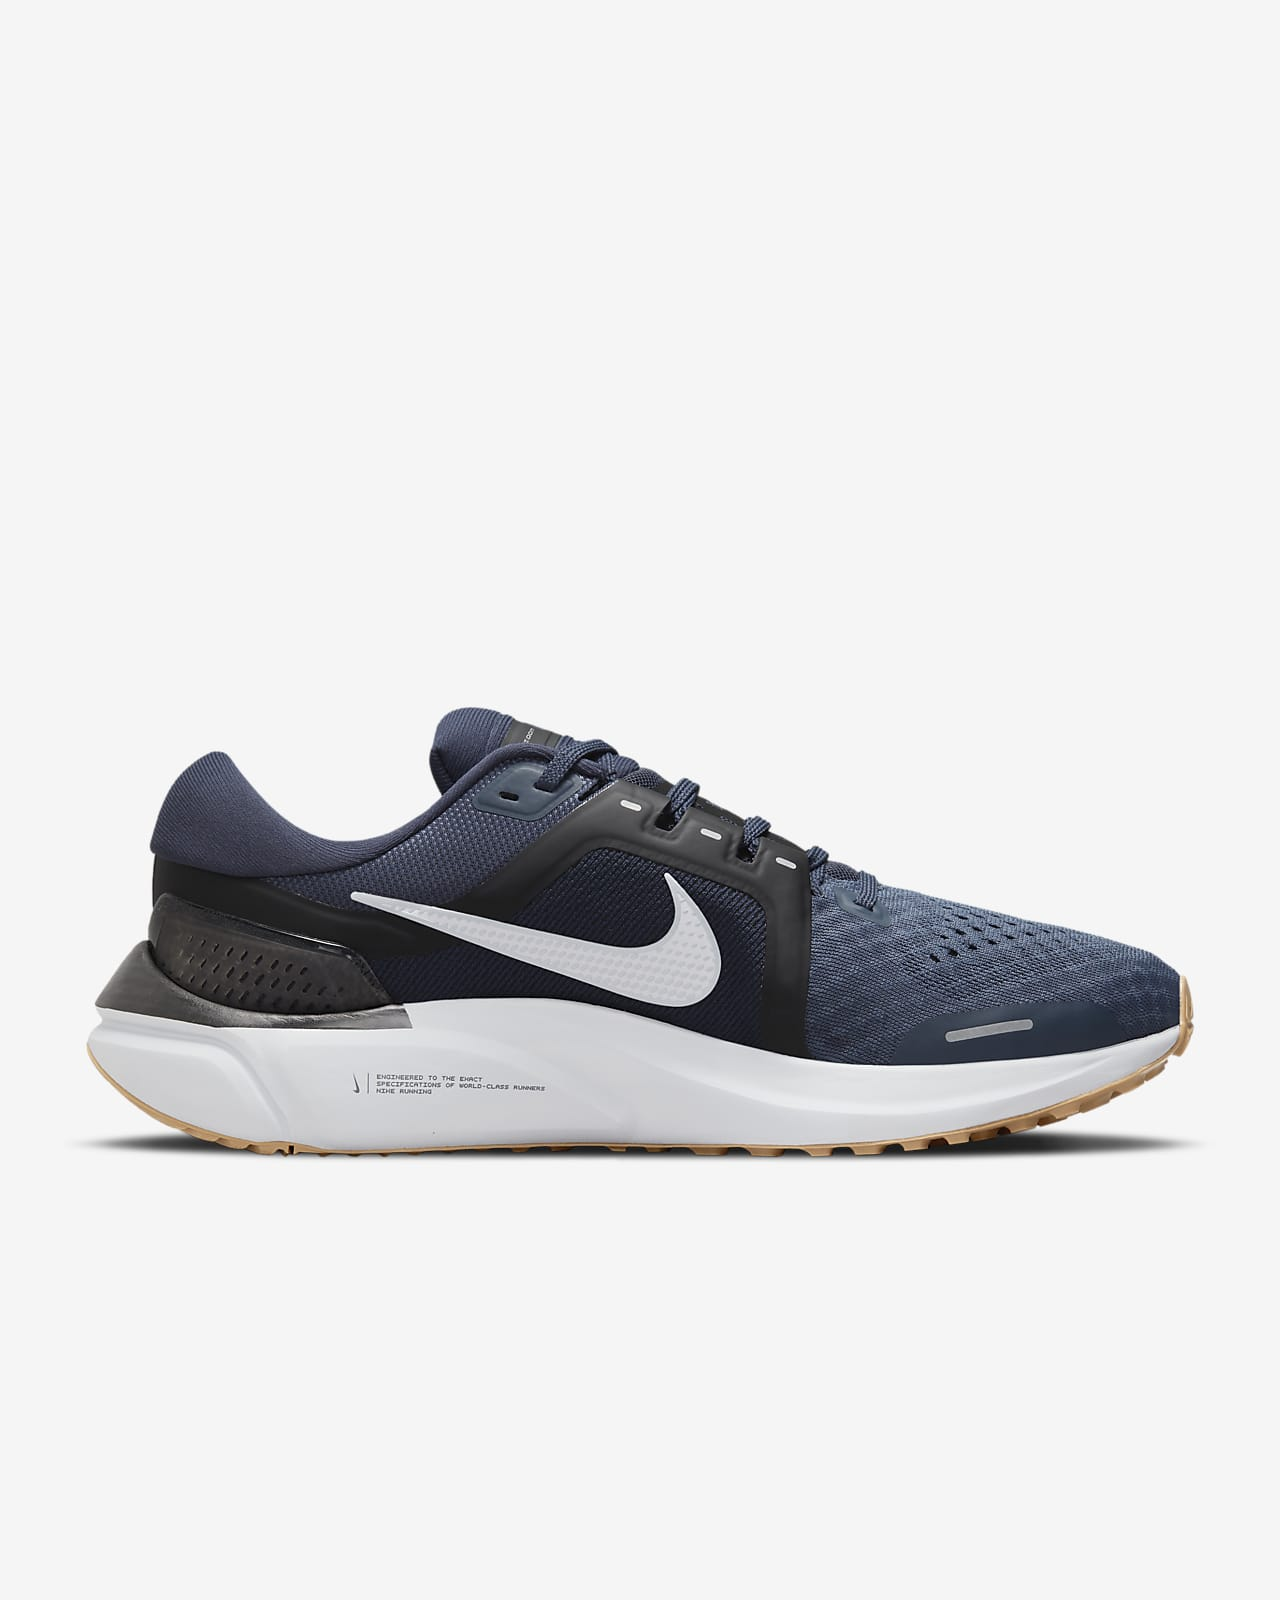 Chaussure de running sur route Nike Air Zoom Vomero 16 pour Homme ...